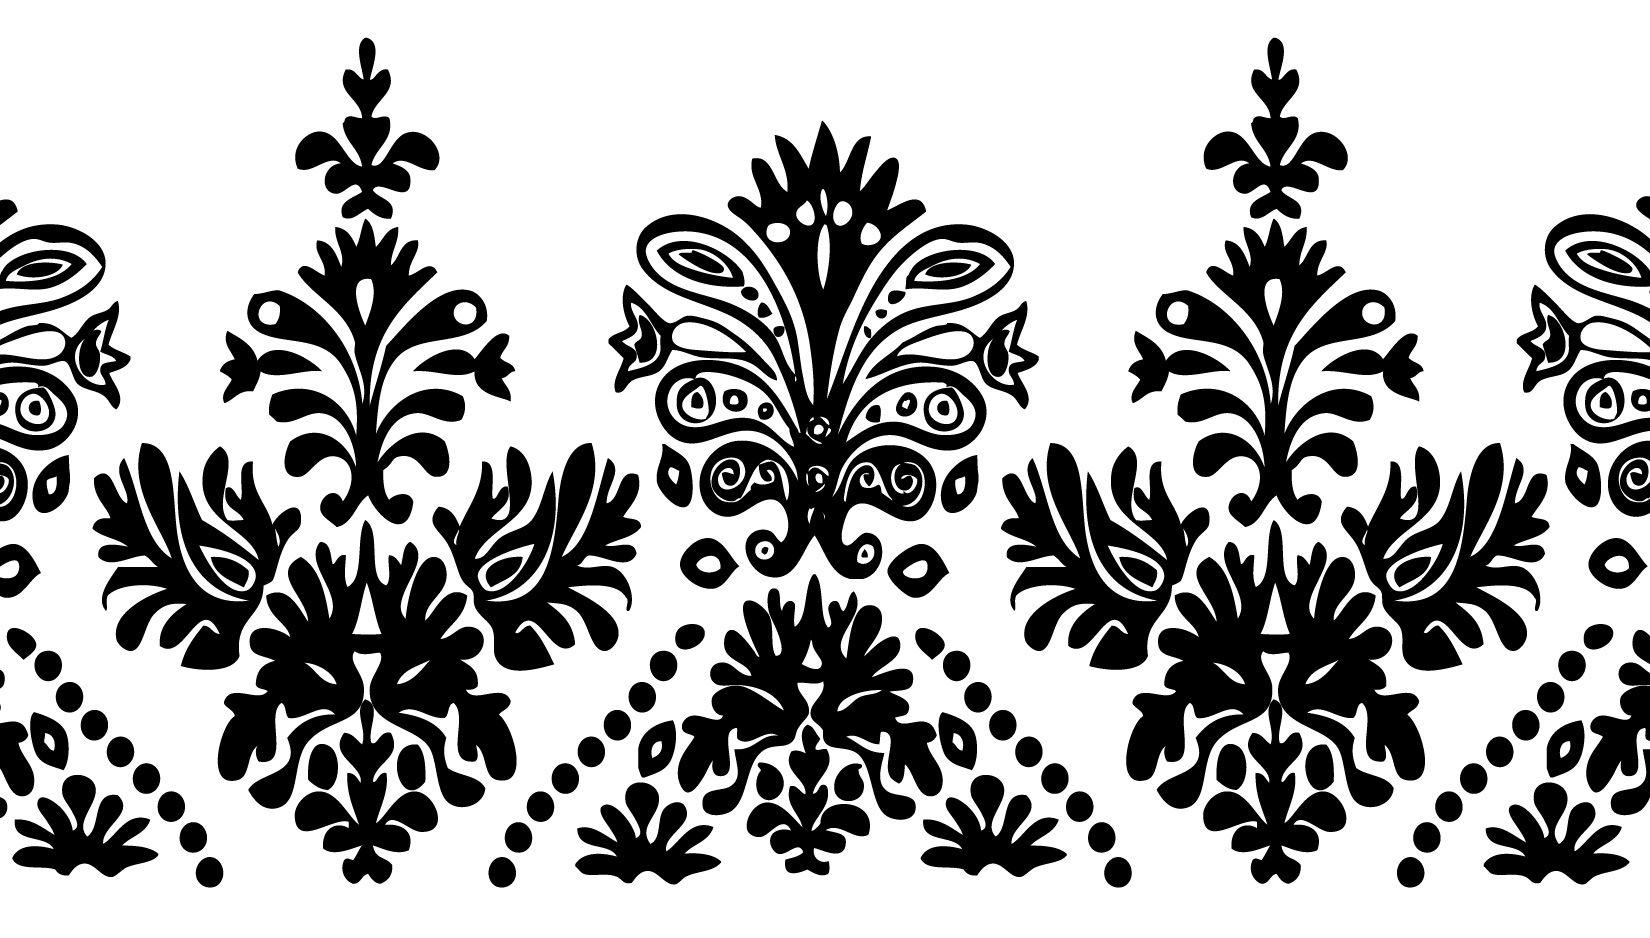 Stencils Designs Free Printable Downloads Stencil 063 Free Stencils Stencil Crafts Free Stencils Printables